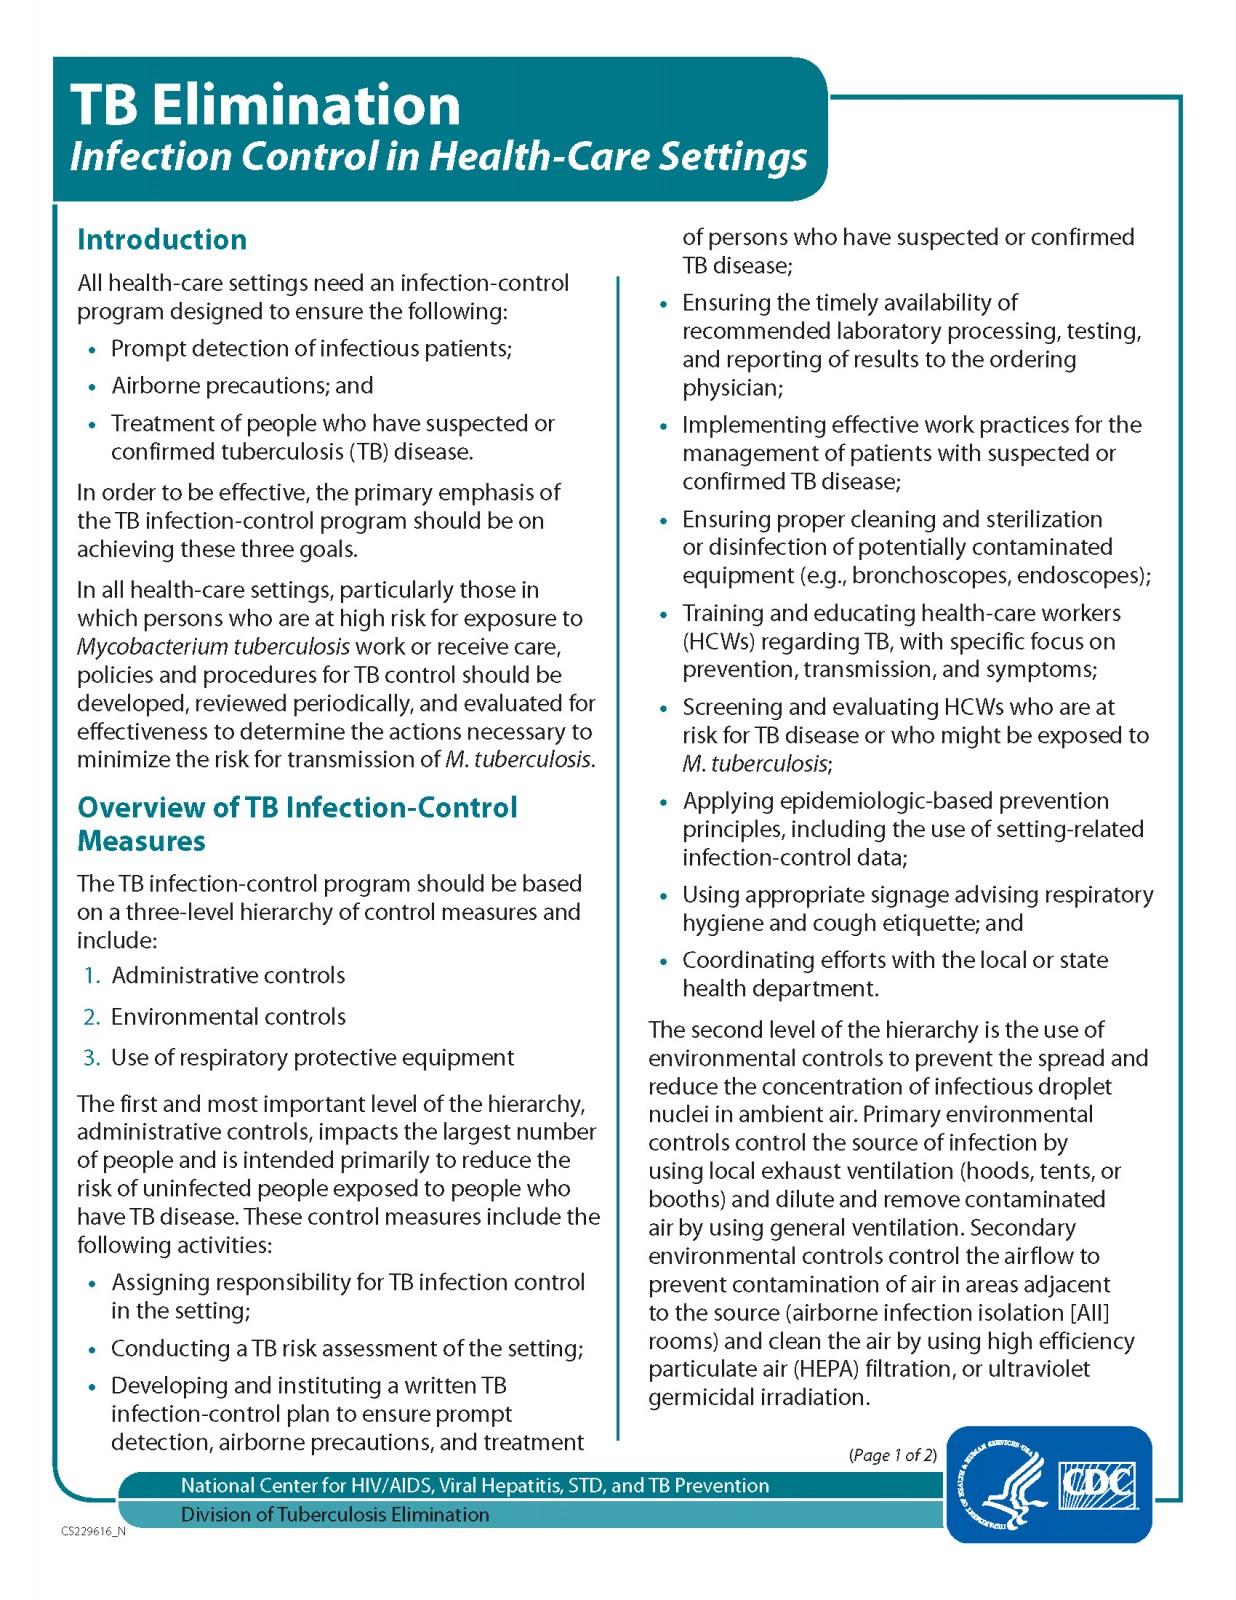 TB Elimination CDC